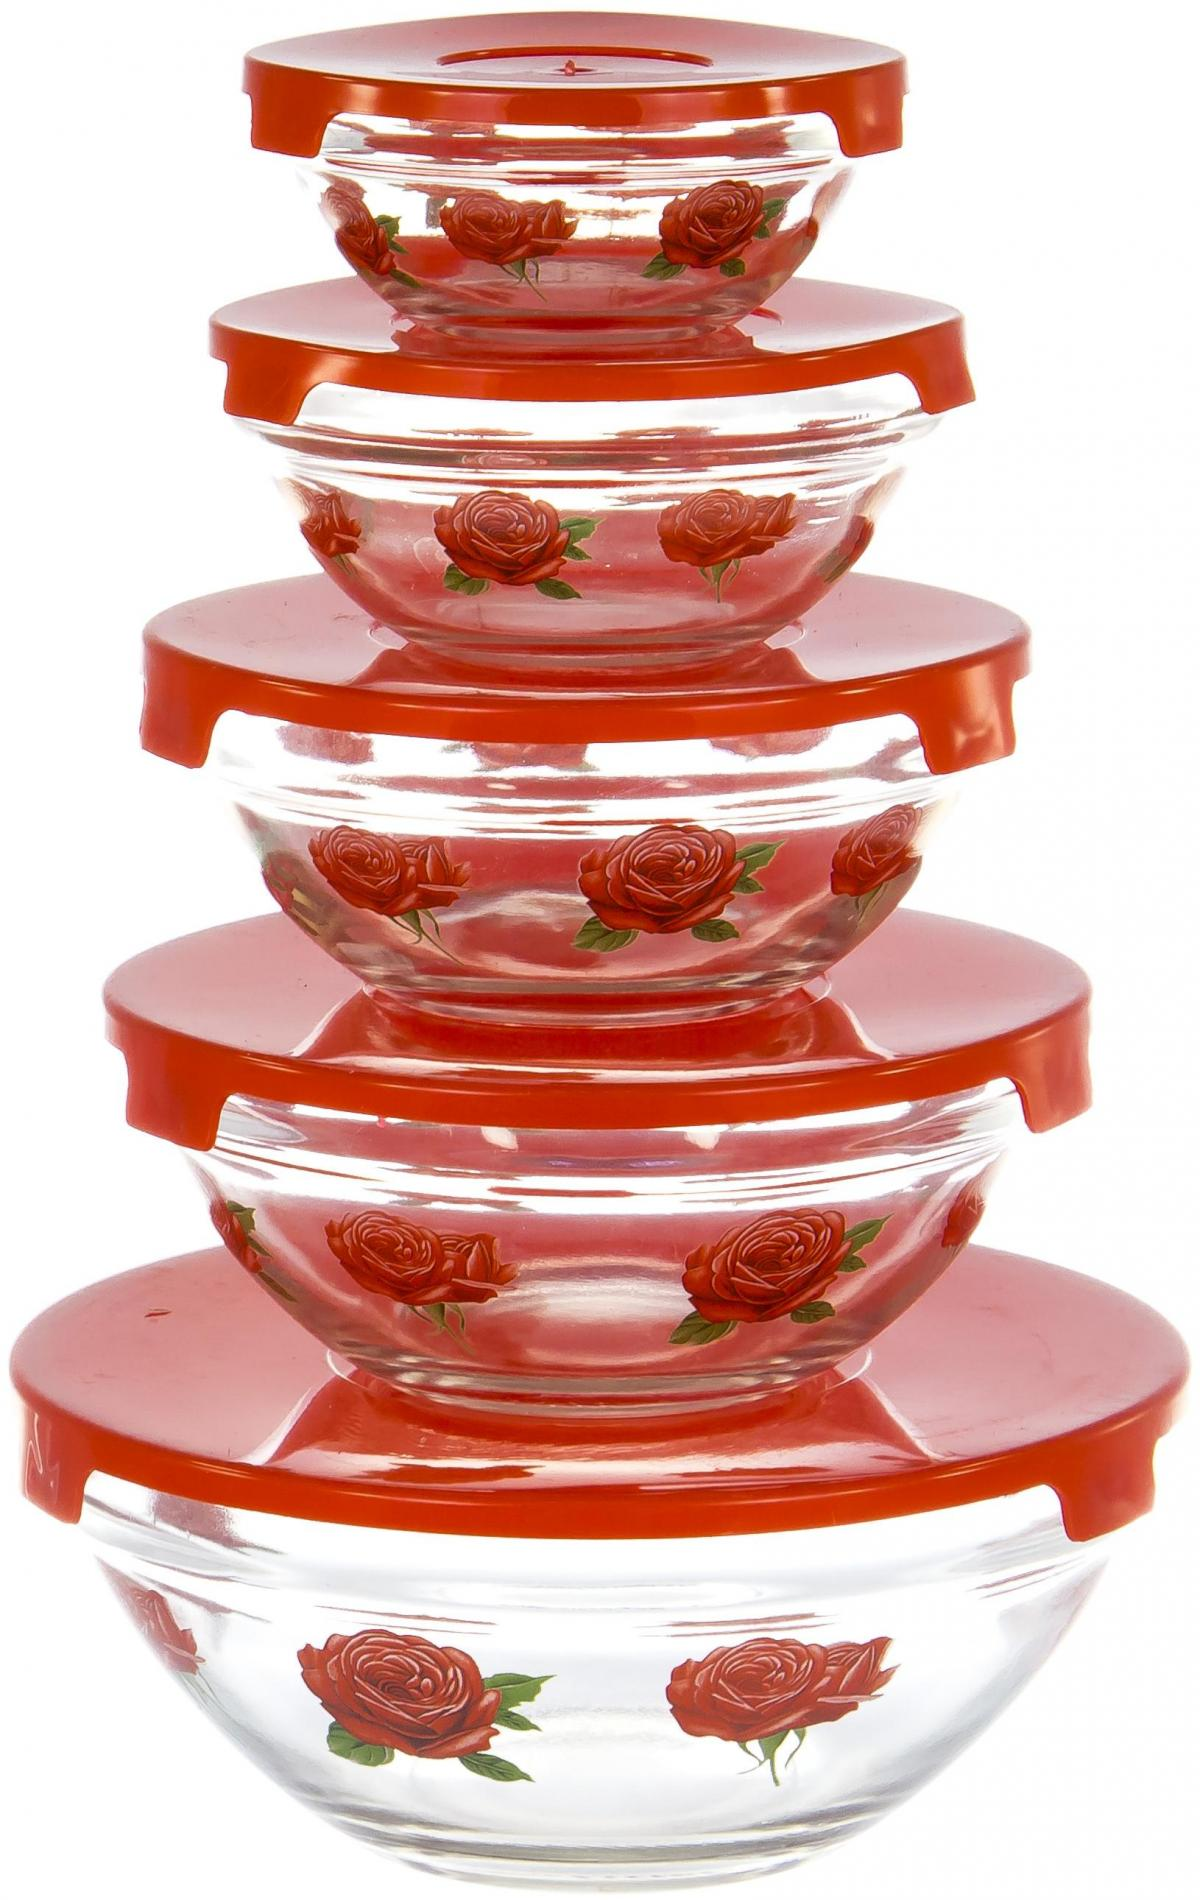 Набор салатников Olaff, с крышкой, 5 предметов. AX-5SB-R-01AX-5SB-R-01набор 5 салатников d-100мм, 103мм, 125мм, 140мм, 170мм с пластик.крышками, подарочная упаковка